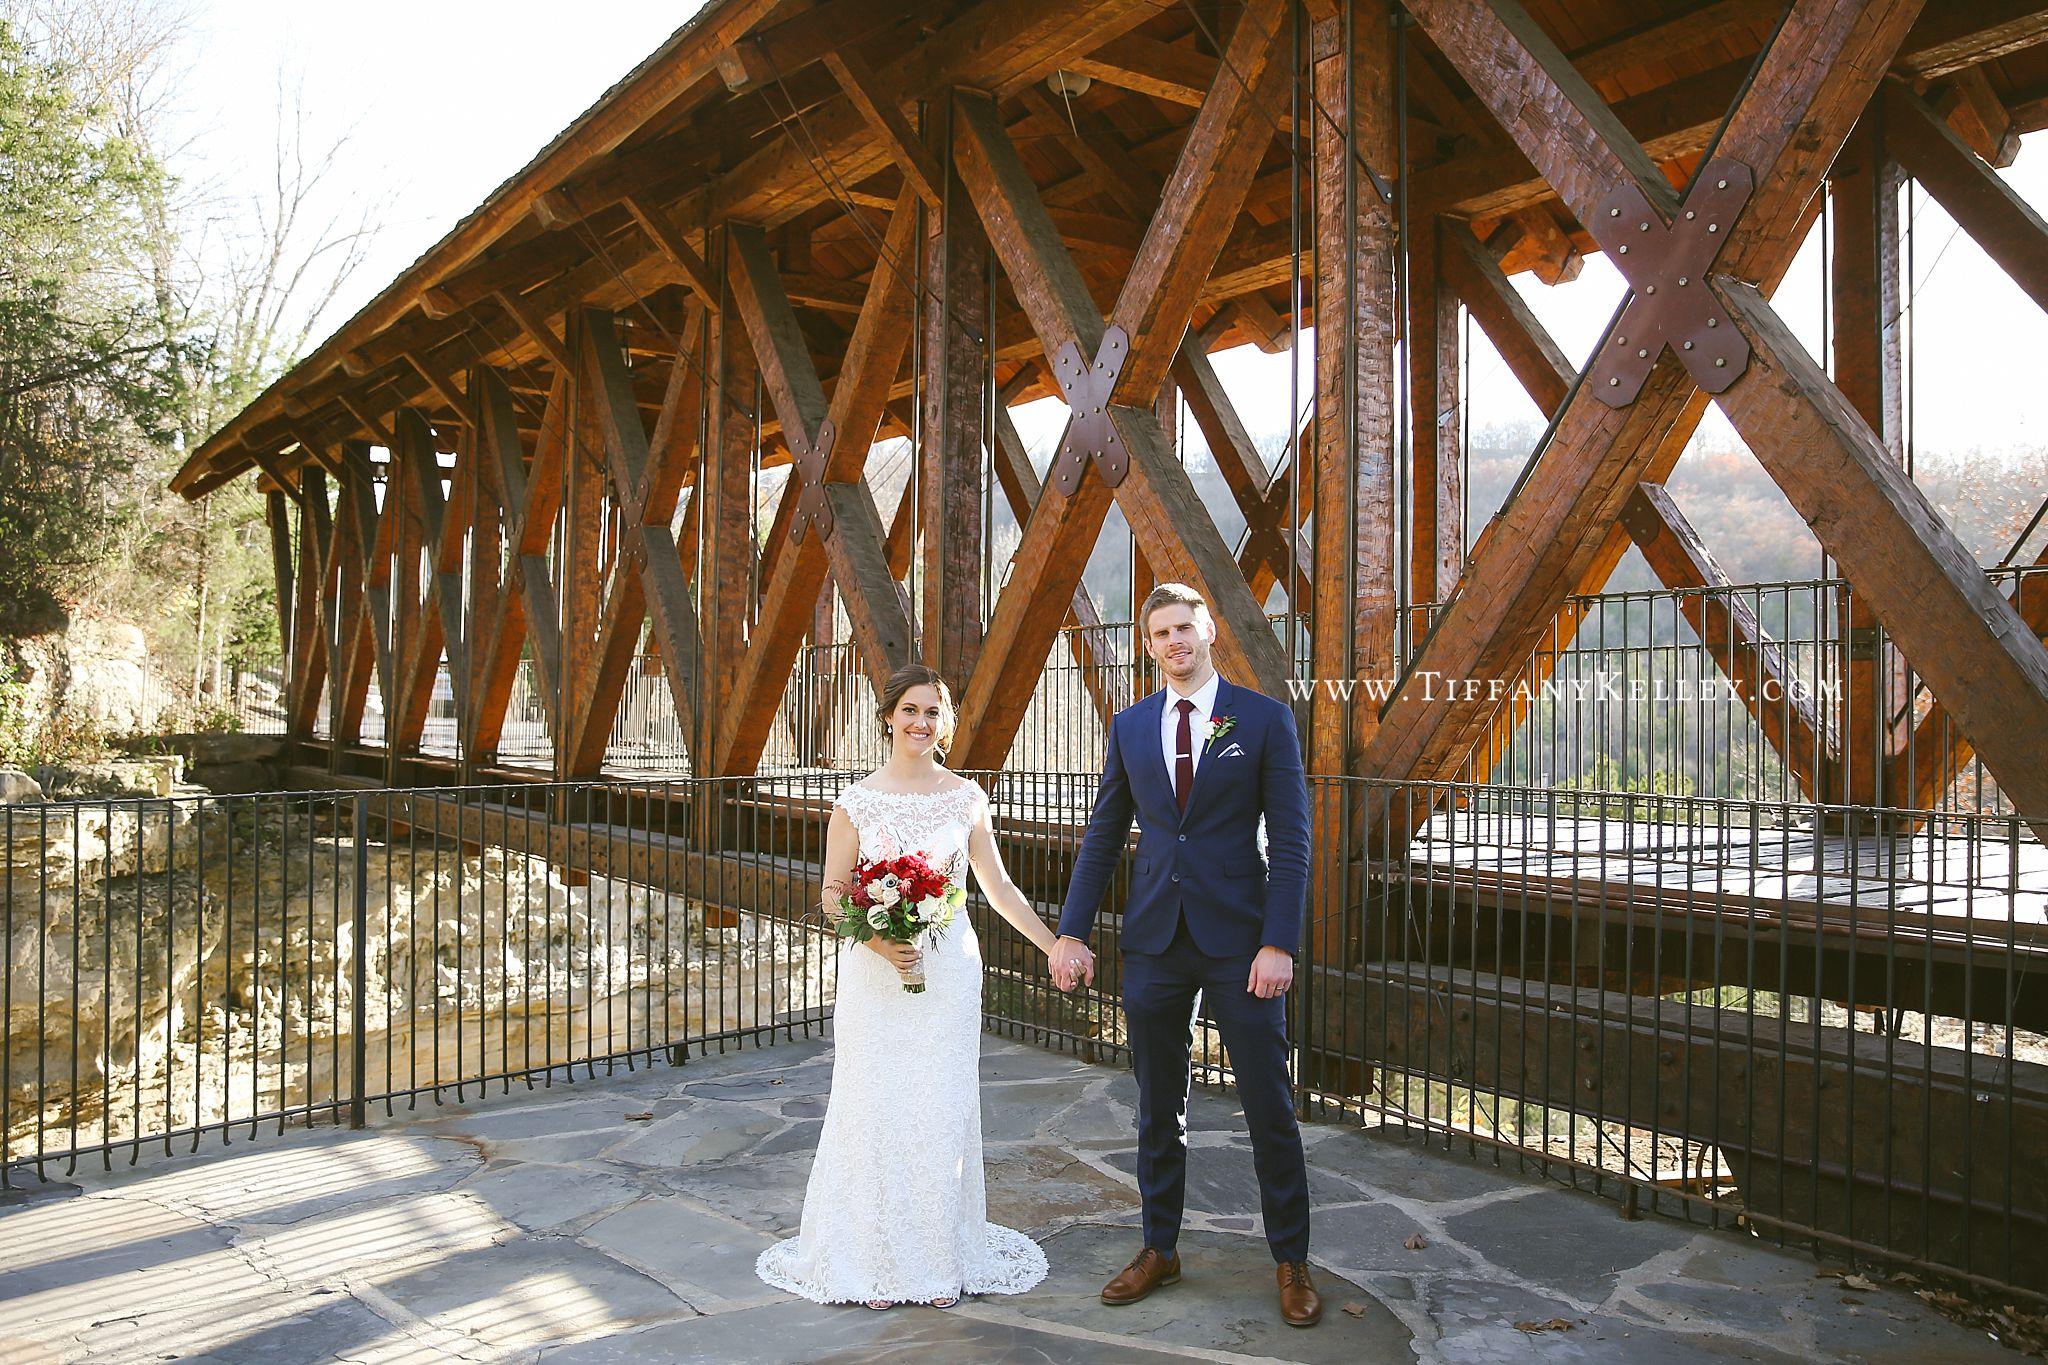 Tiffany Kelley Branson, MO Elopement and Wedding Photographer